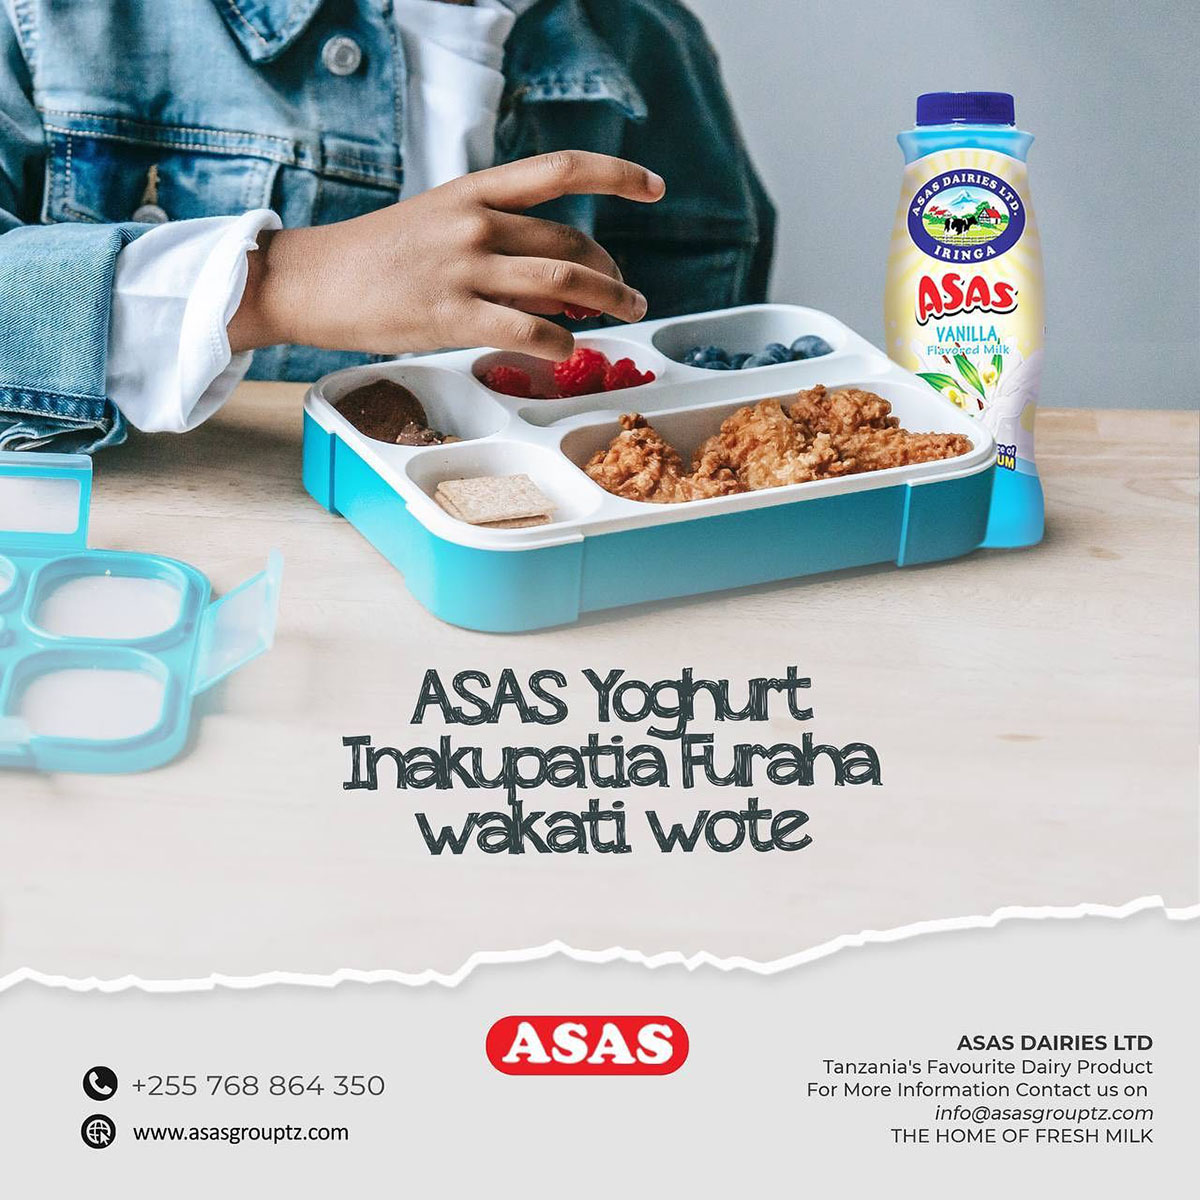 Asas-Dairies-Asas-Yoghurt-inakupatia-furaha-wakati-wote